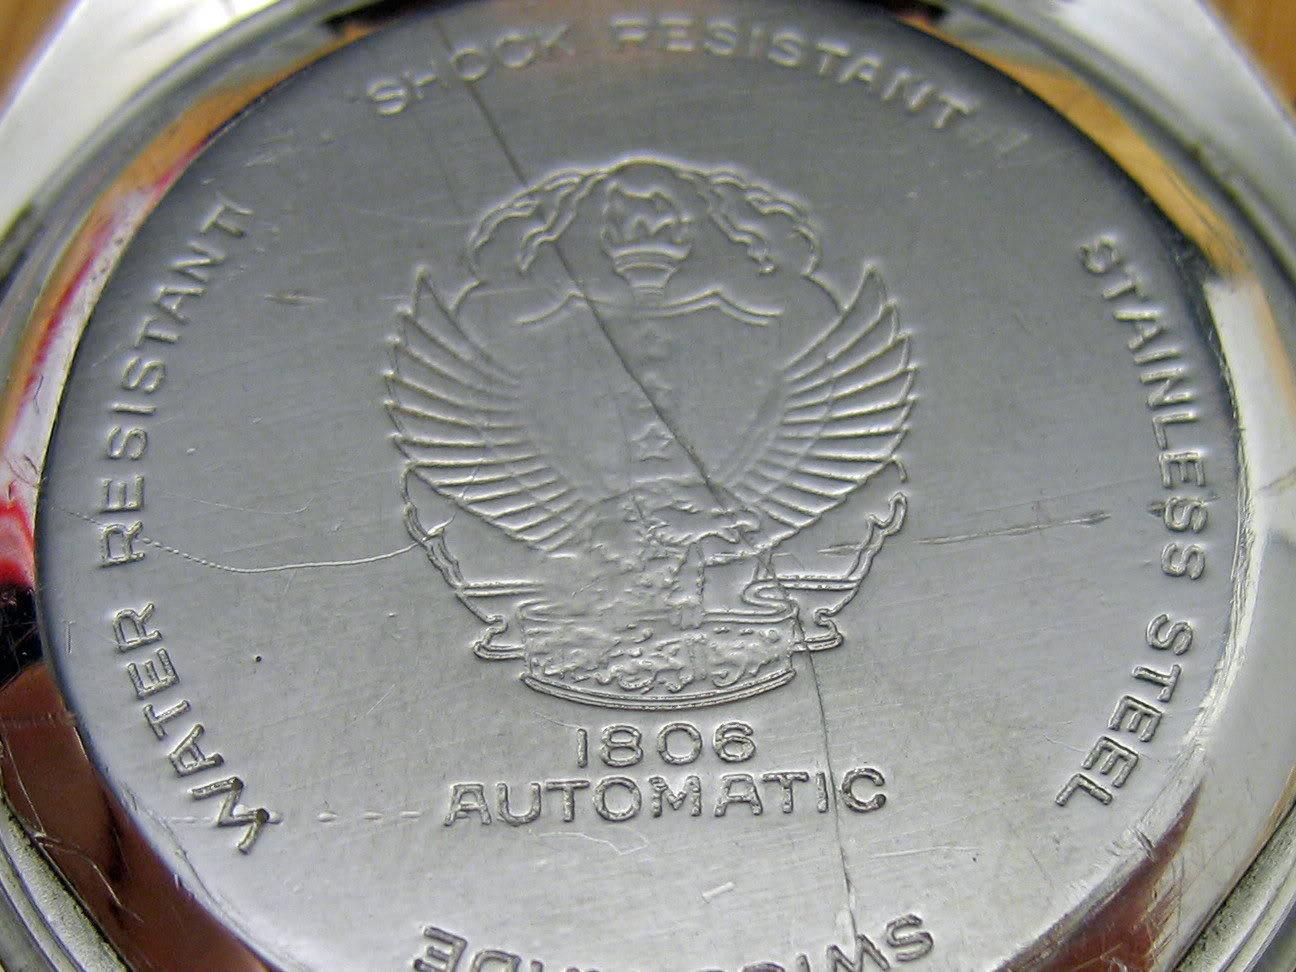 Les montres militaires : Votre avis Breitlingiraqiback